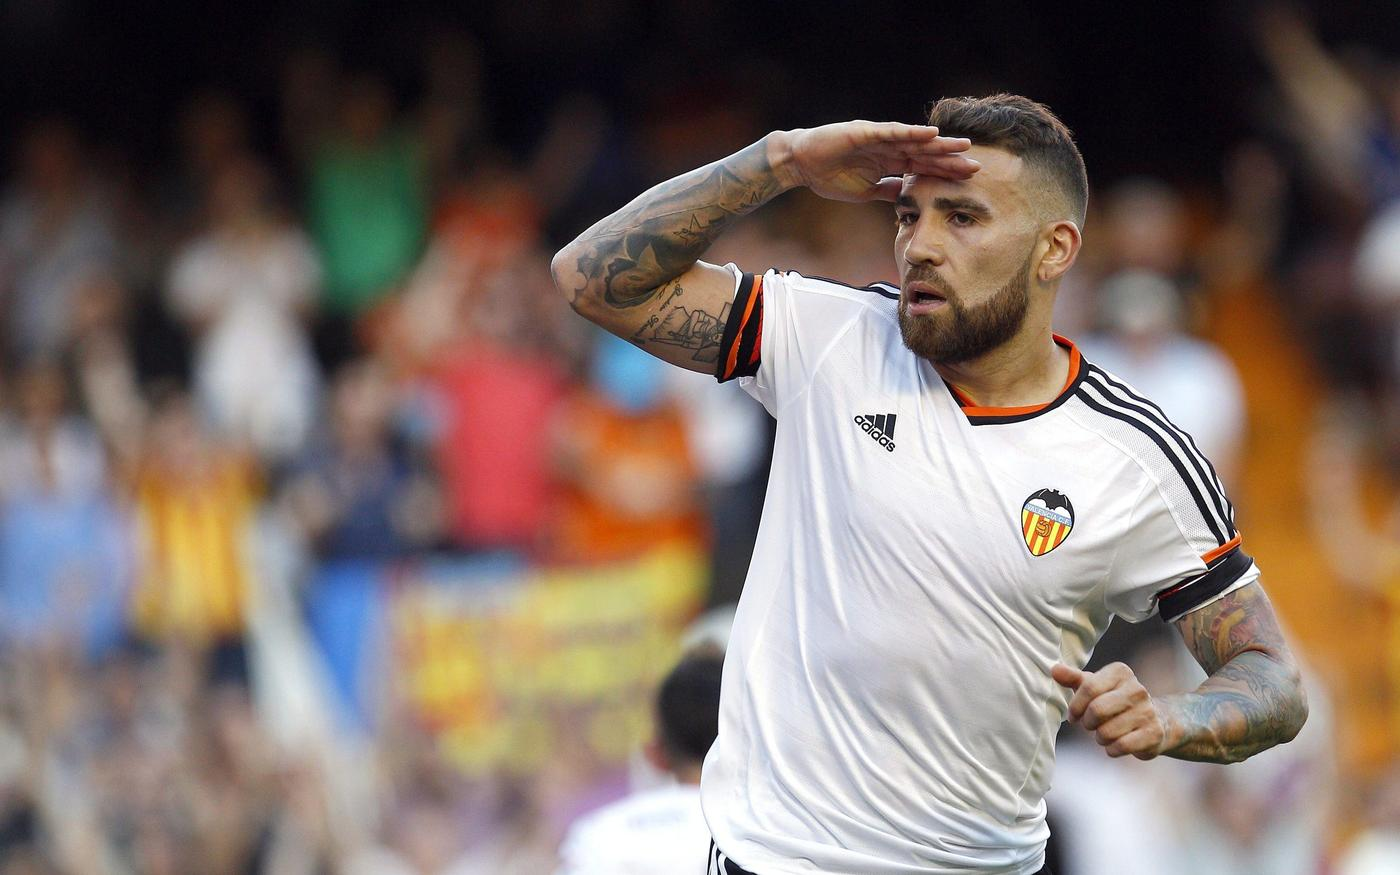 Manchester United transfer target Nicolas Otamendi 'would be an upgrade on Sergio Ramos'